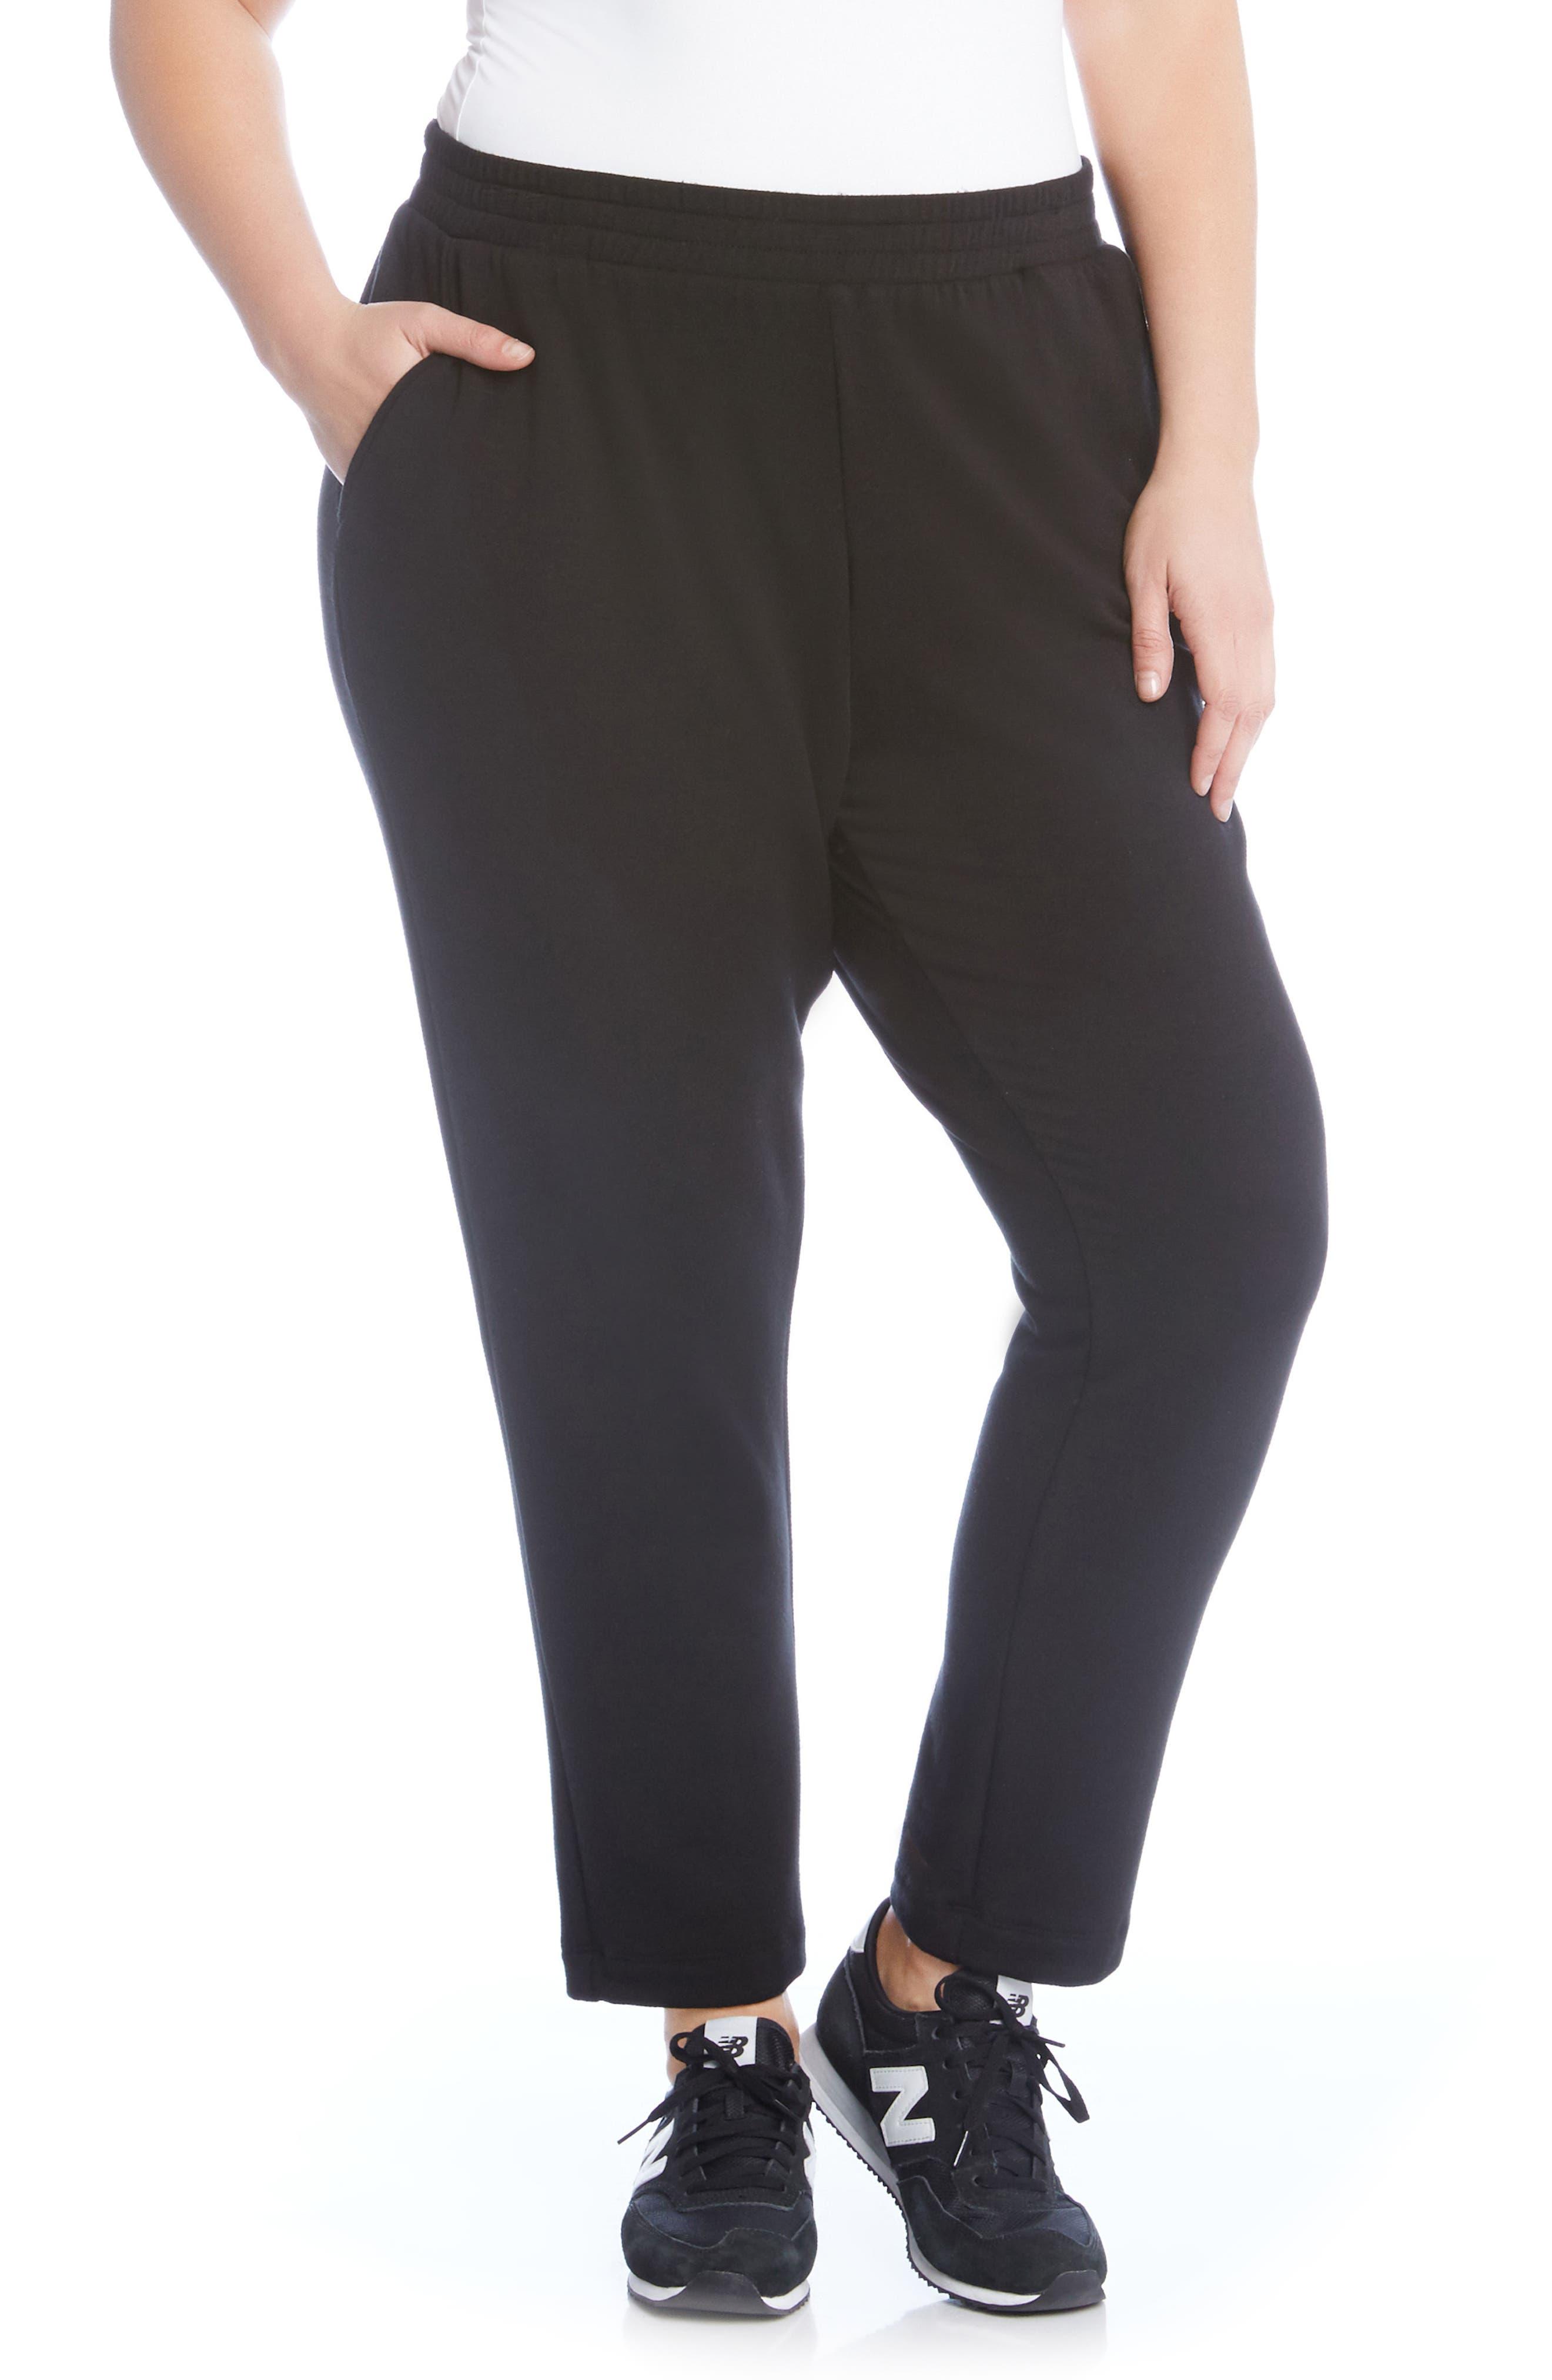 Pull-On Sweatpants,                             Main thumbnail 1, color,                             Black